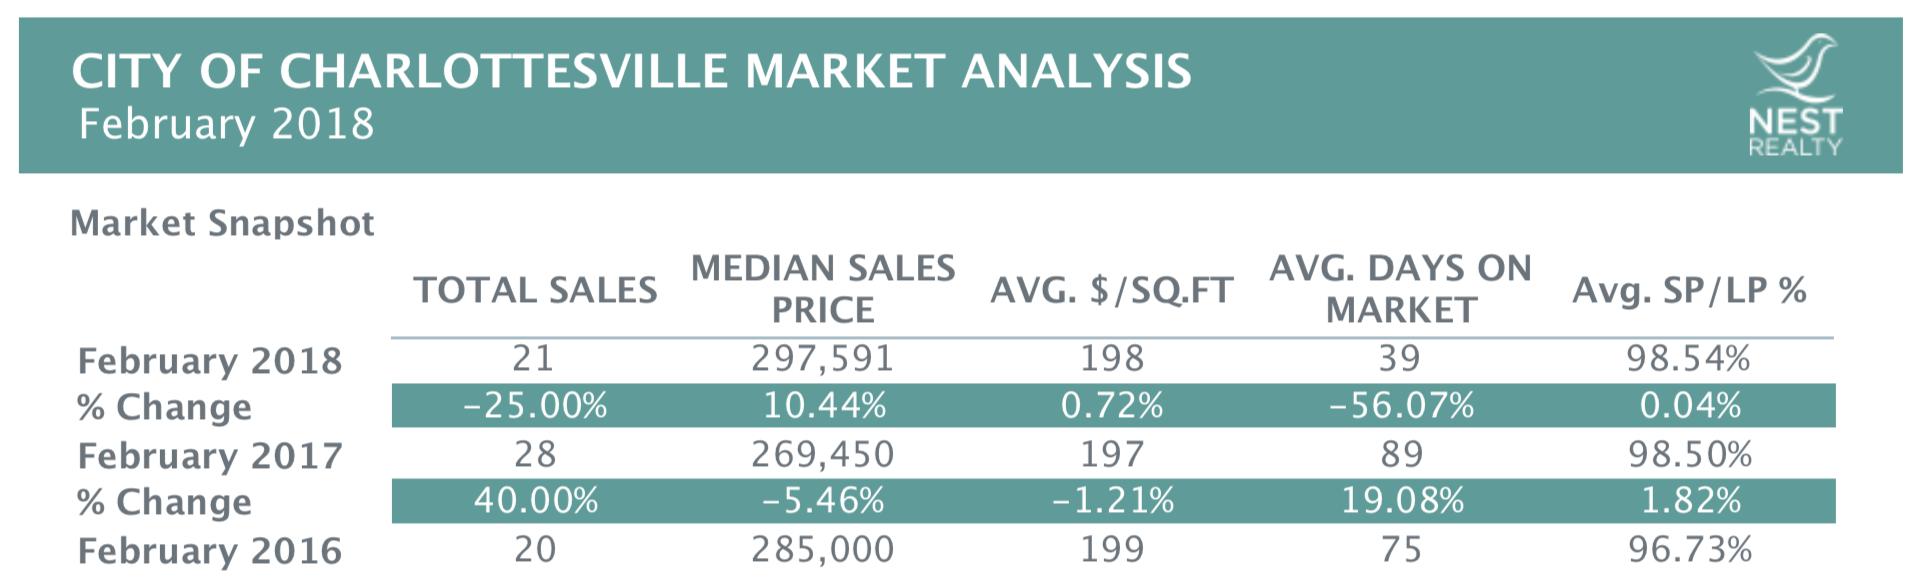 February 2018 Real Estate Market Stats For Charlottesville Region